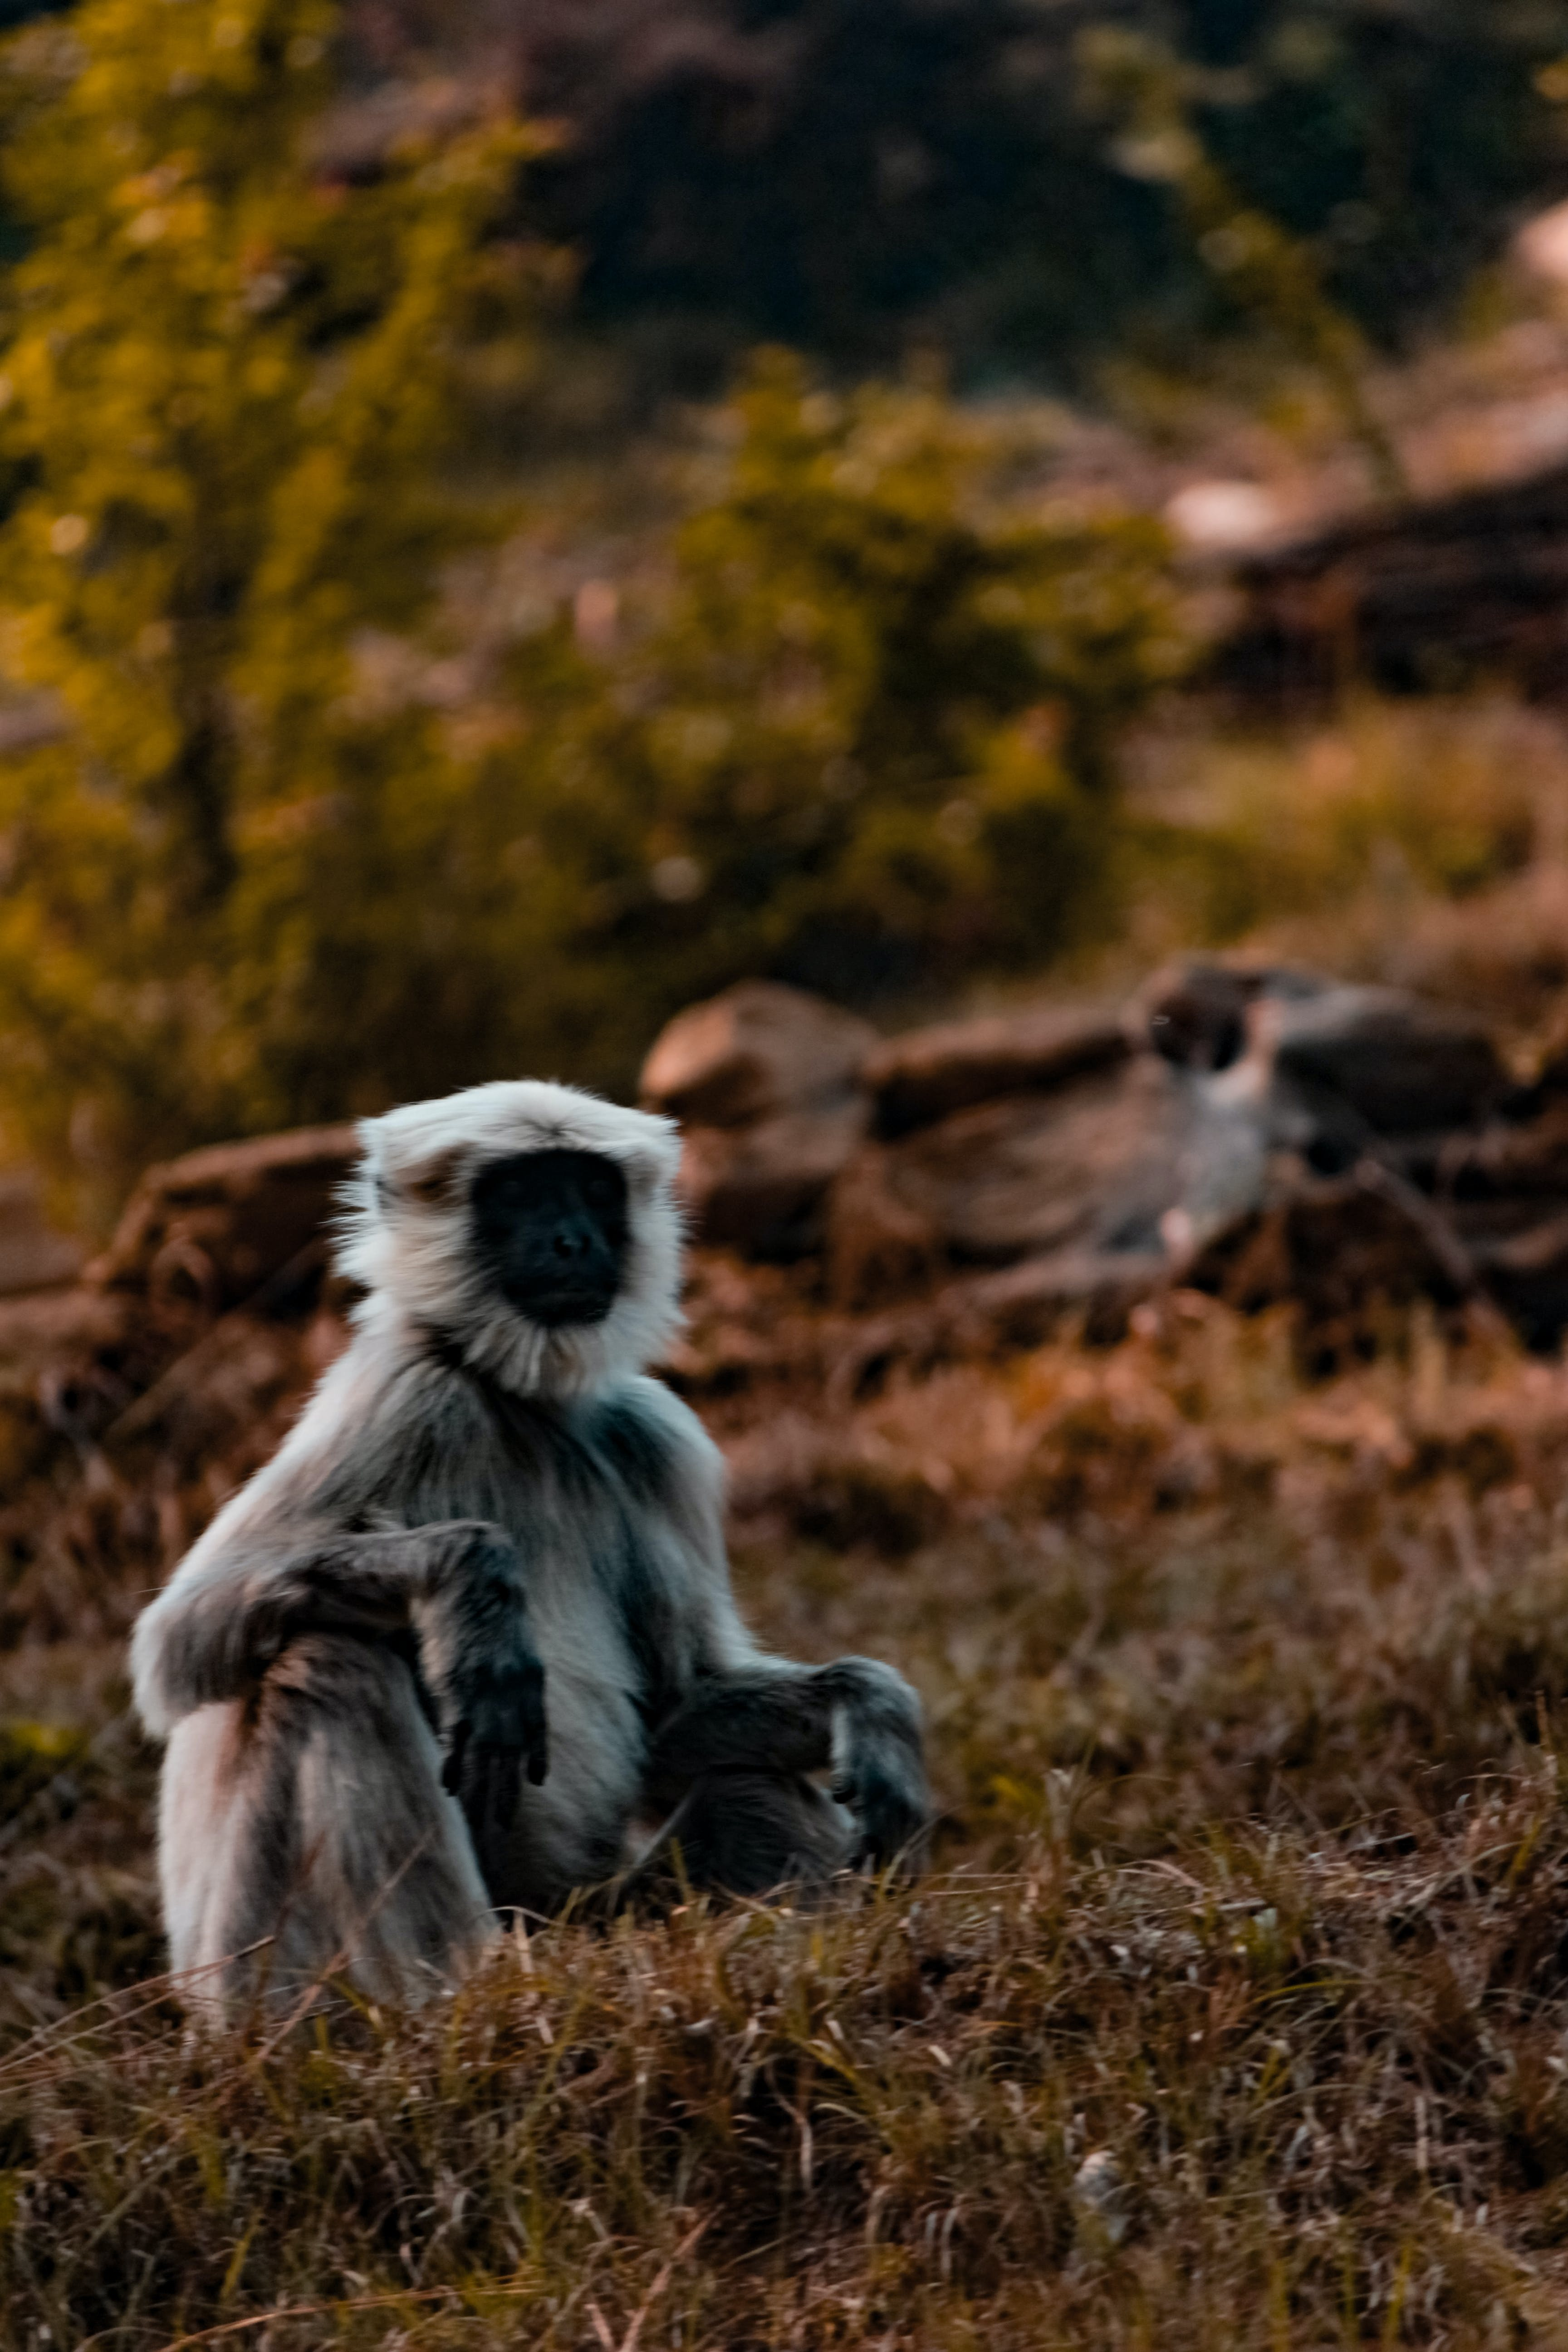 Monkey Sitting on Grass Field